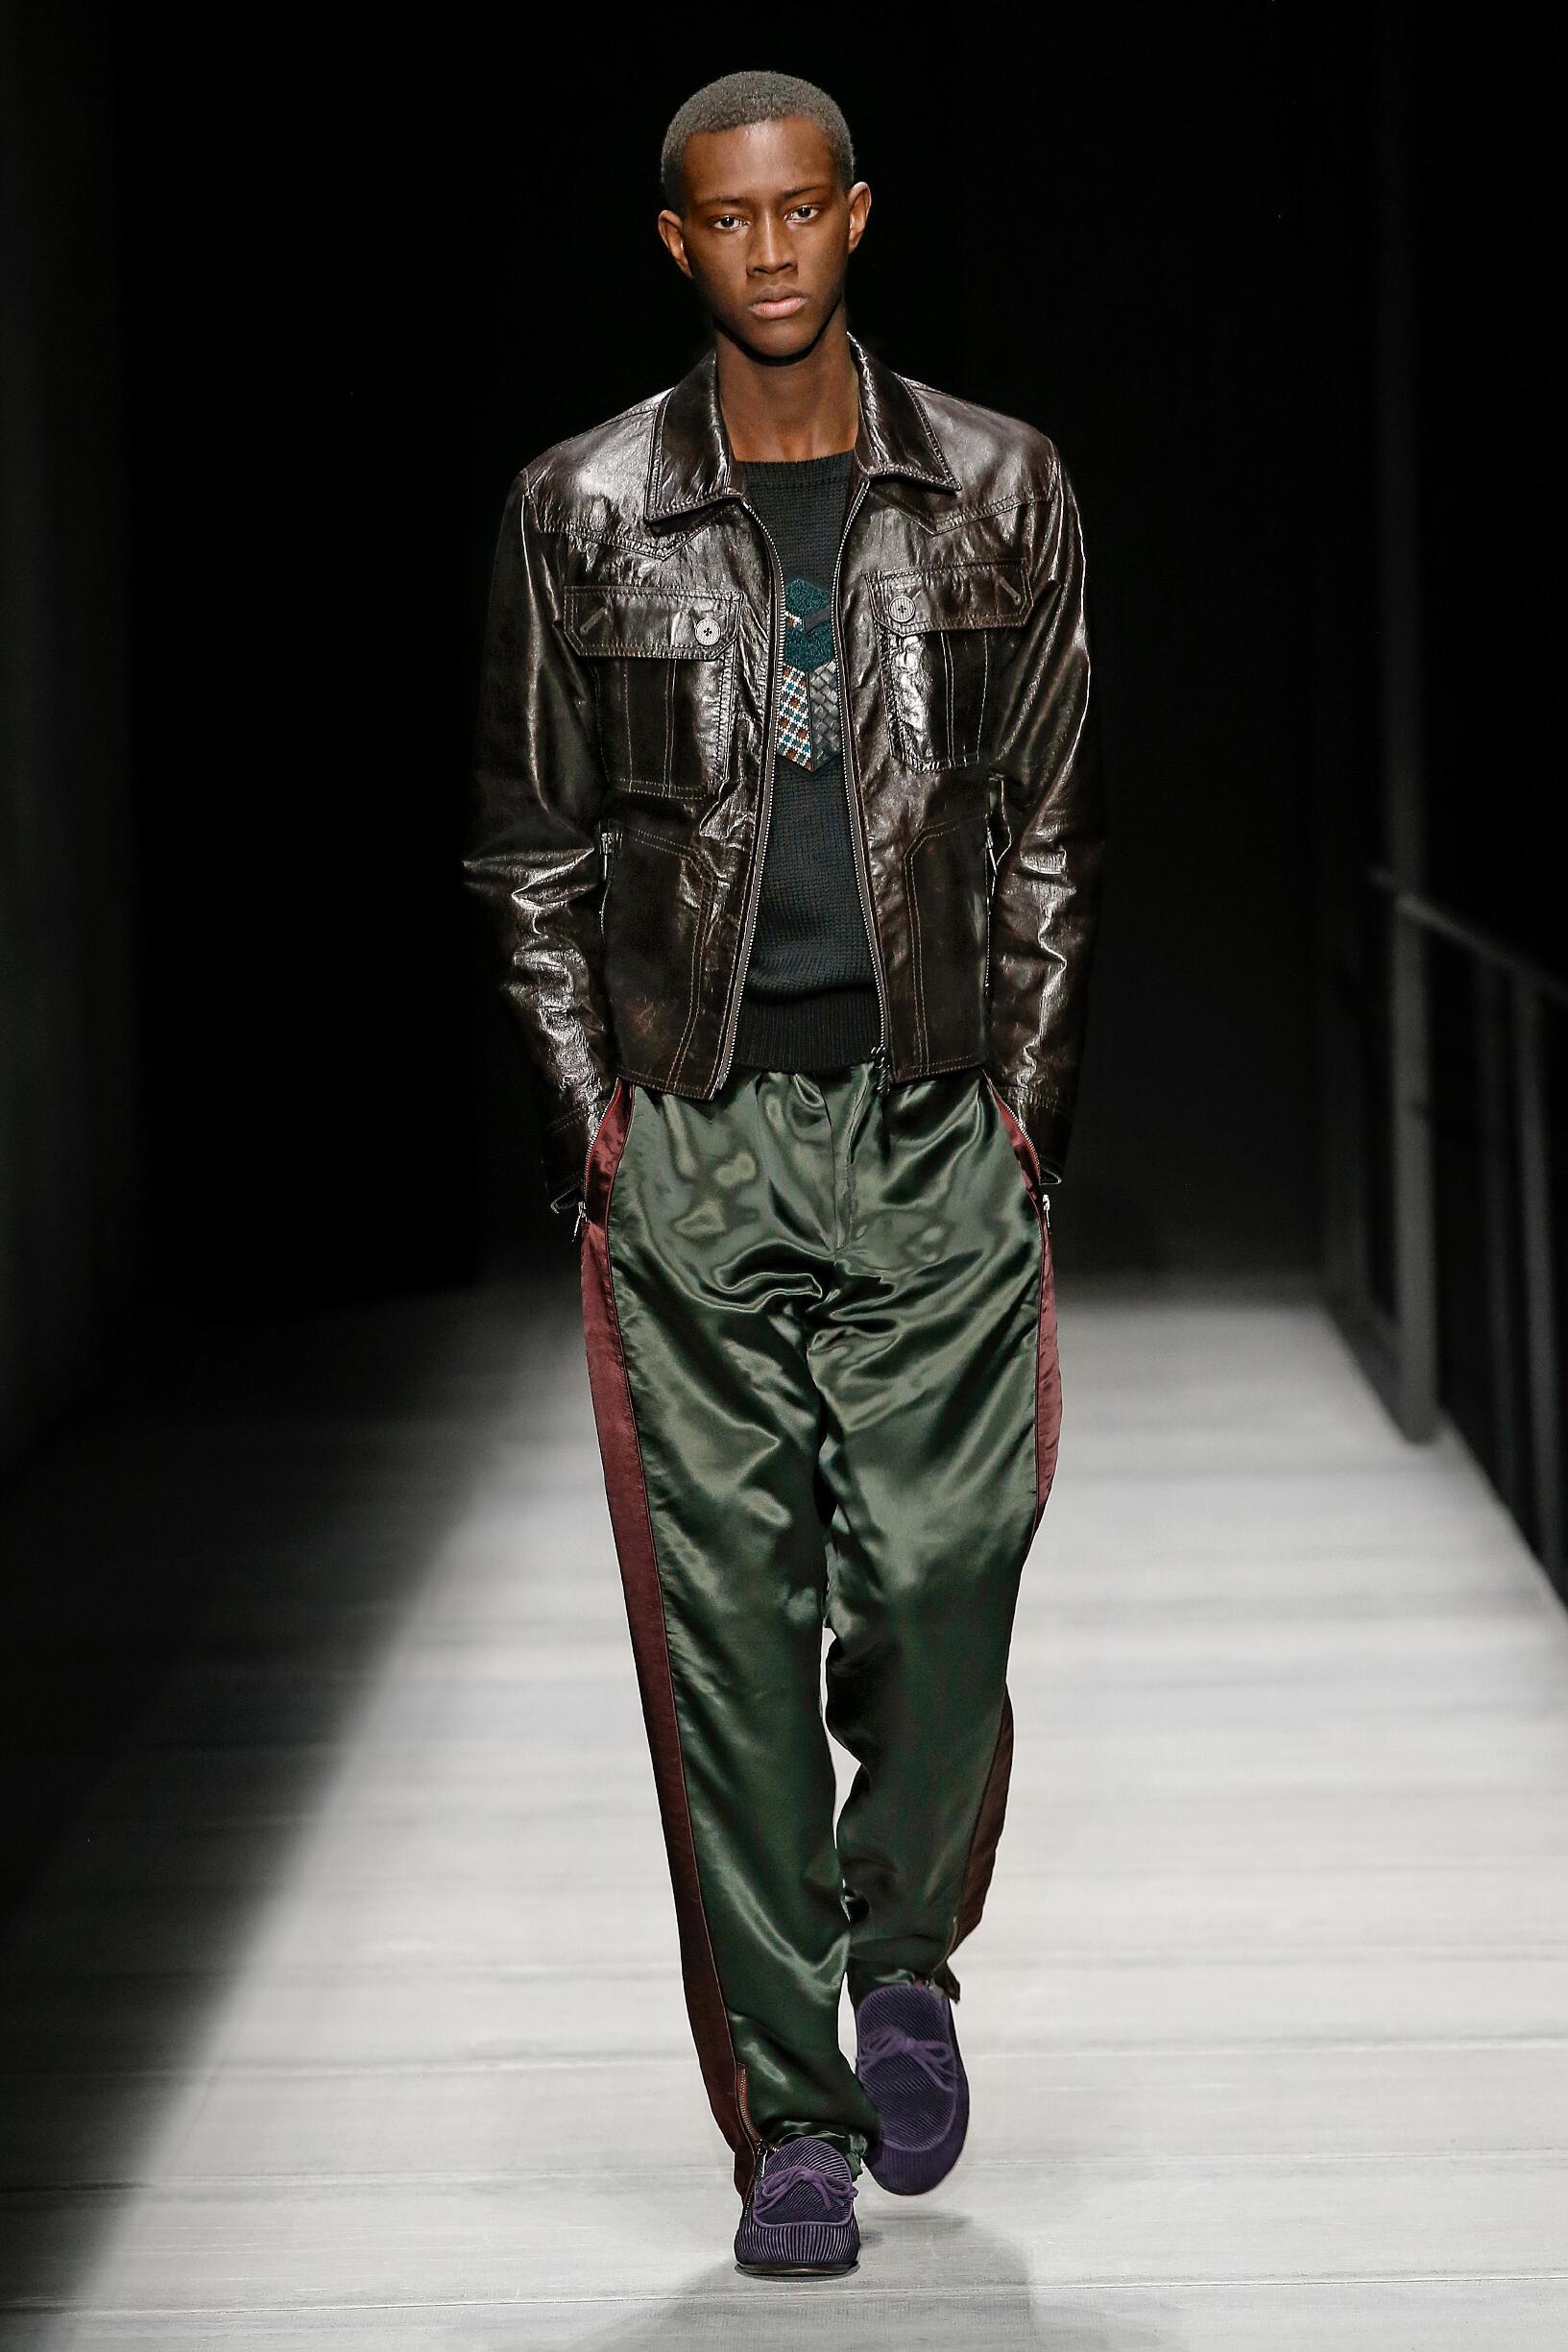 Man FW 2018-19 Bottega Veneta Fashion Show New York